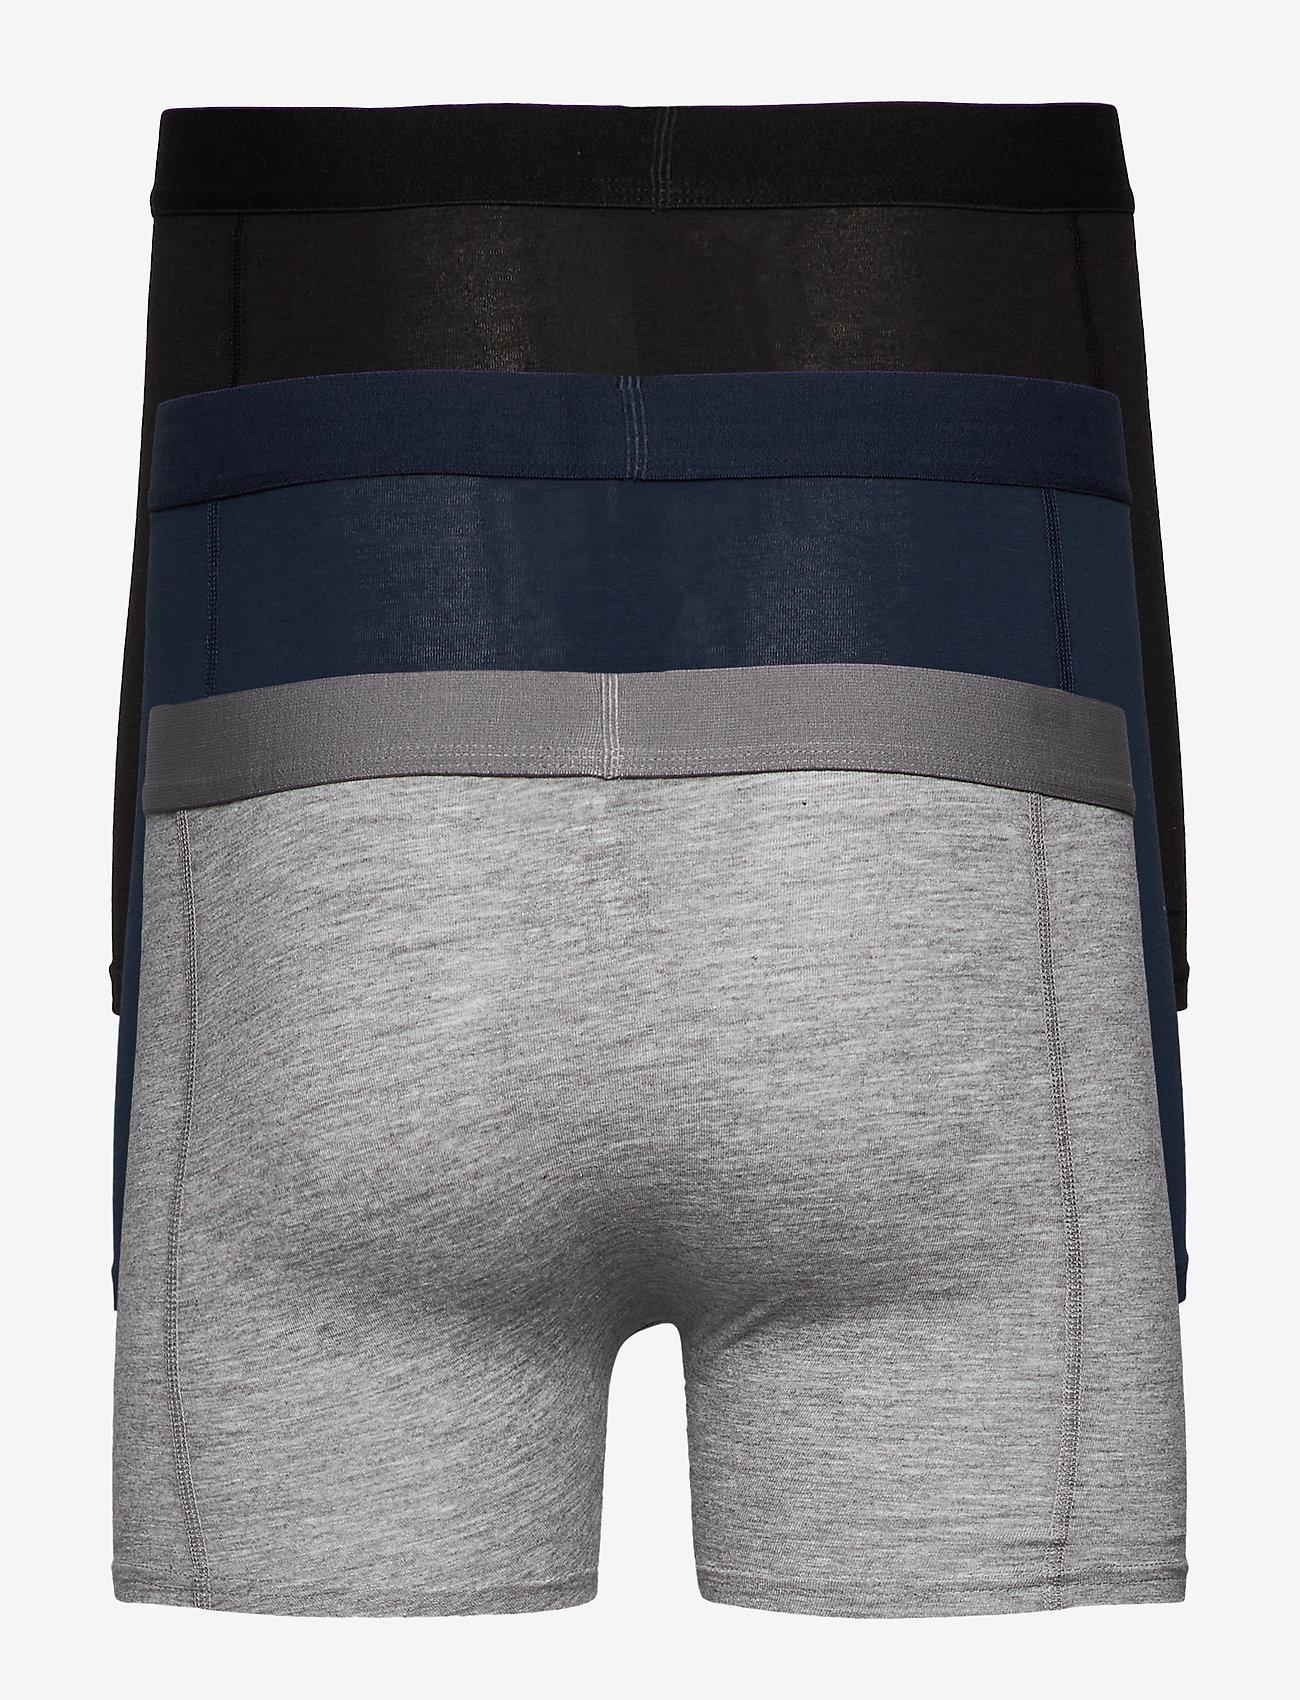 Danish Endurance - Classic Trunks 3 Pack - ondergoed - multicolour (black, navy blue, grey) - 1